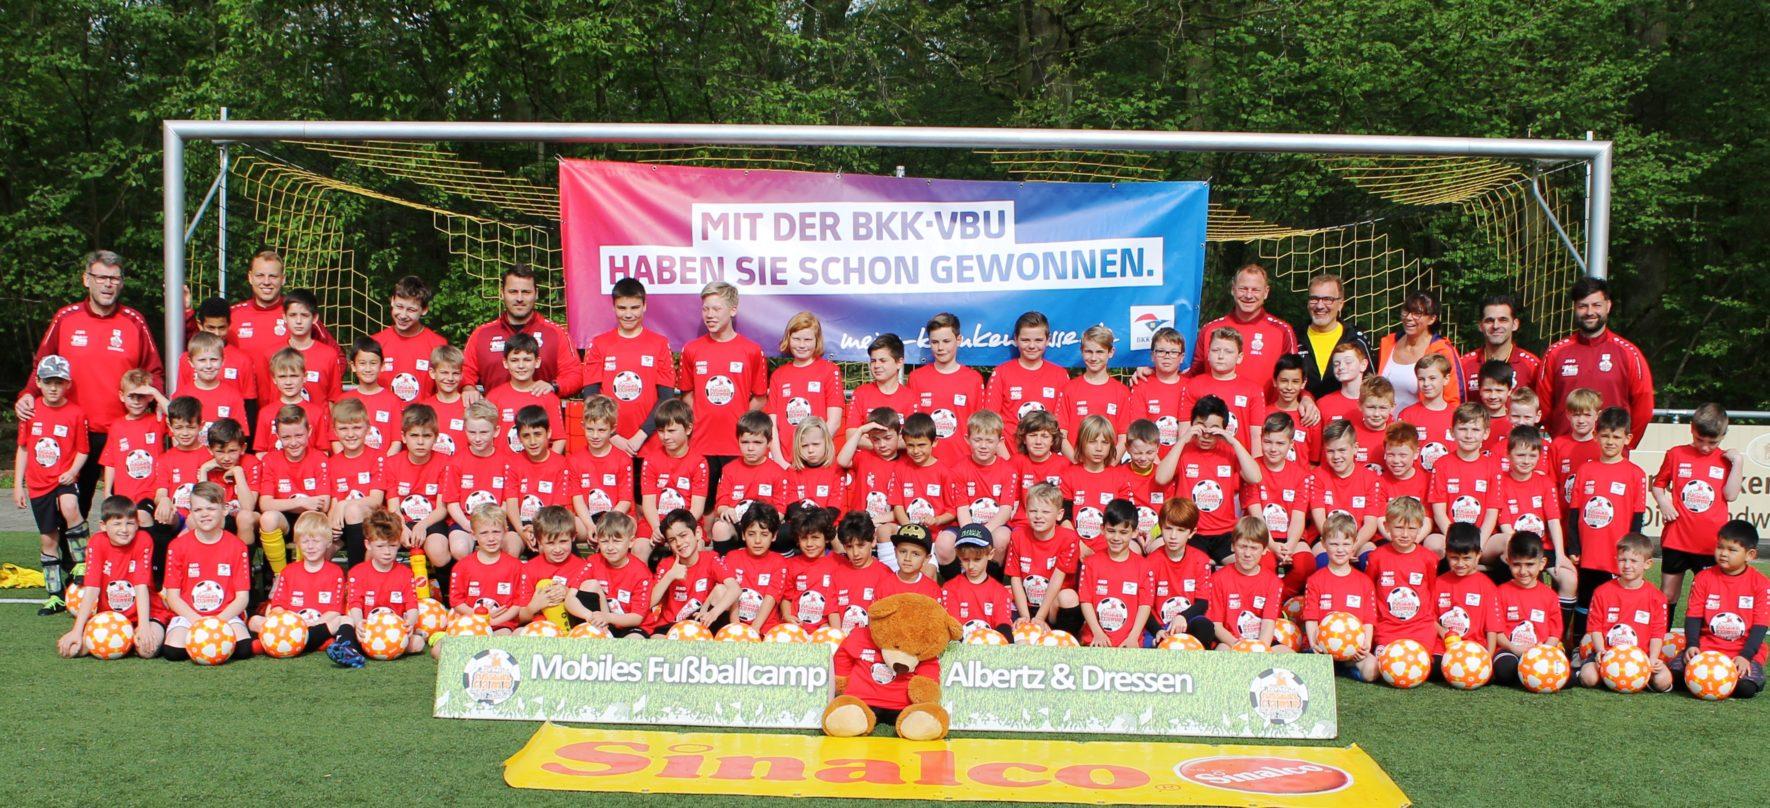 Mobiles Fußballcamp 2020 in den Sommerferien